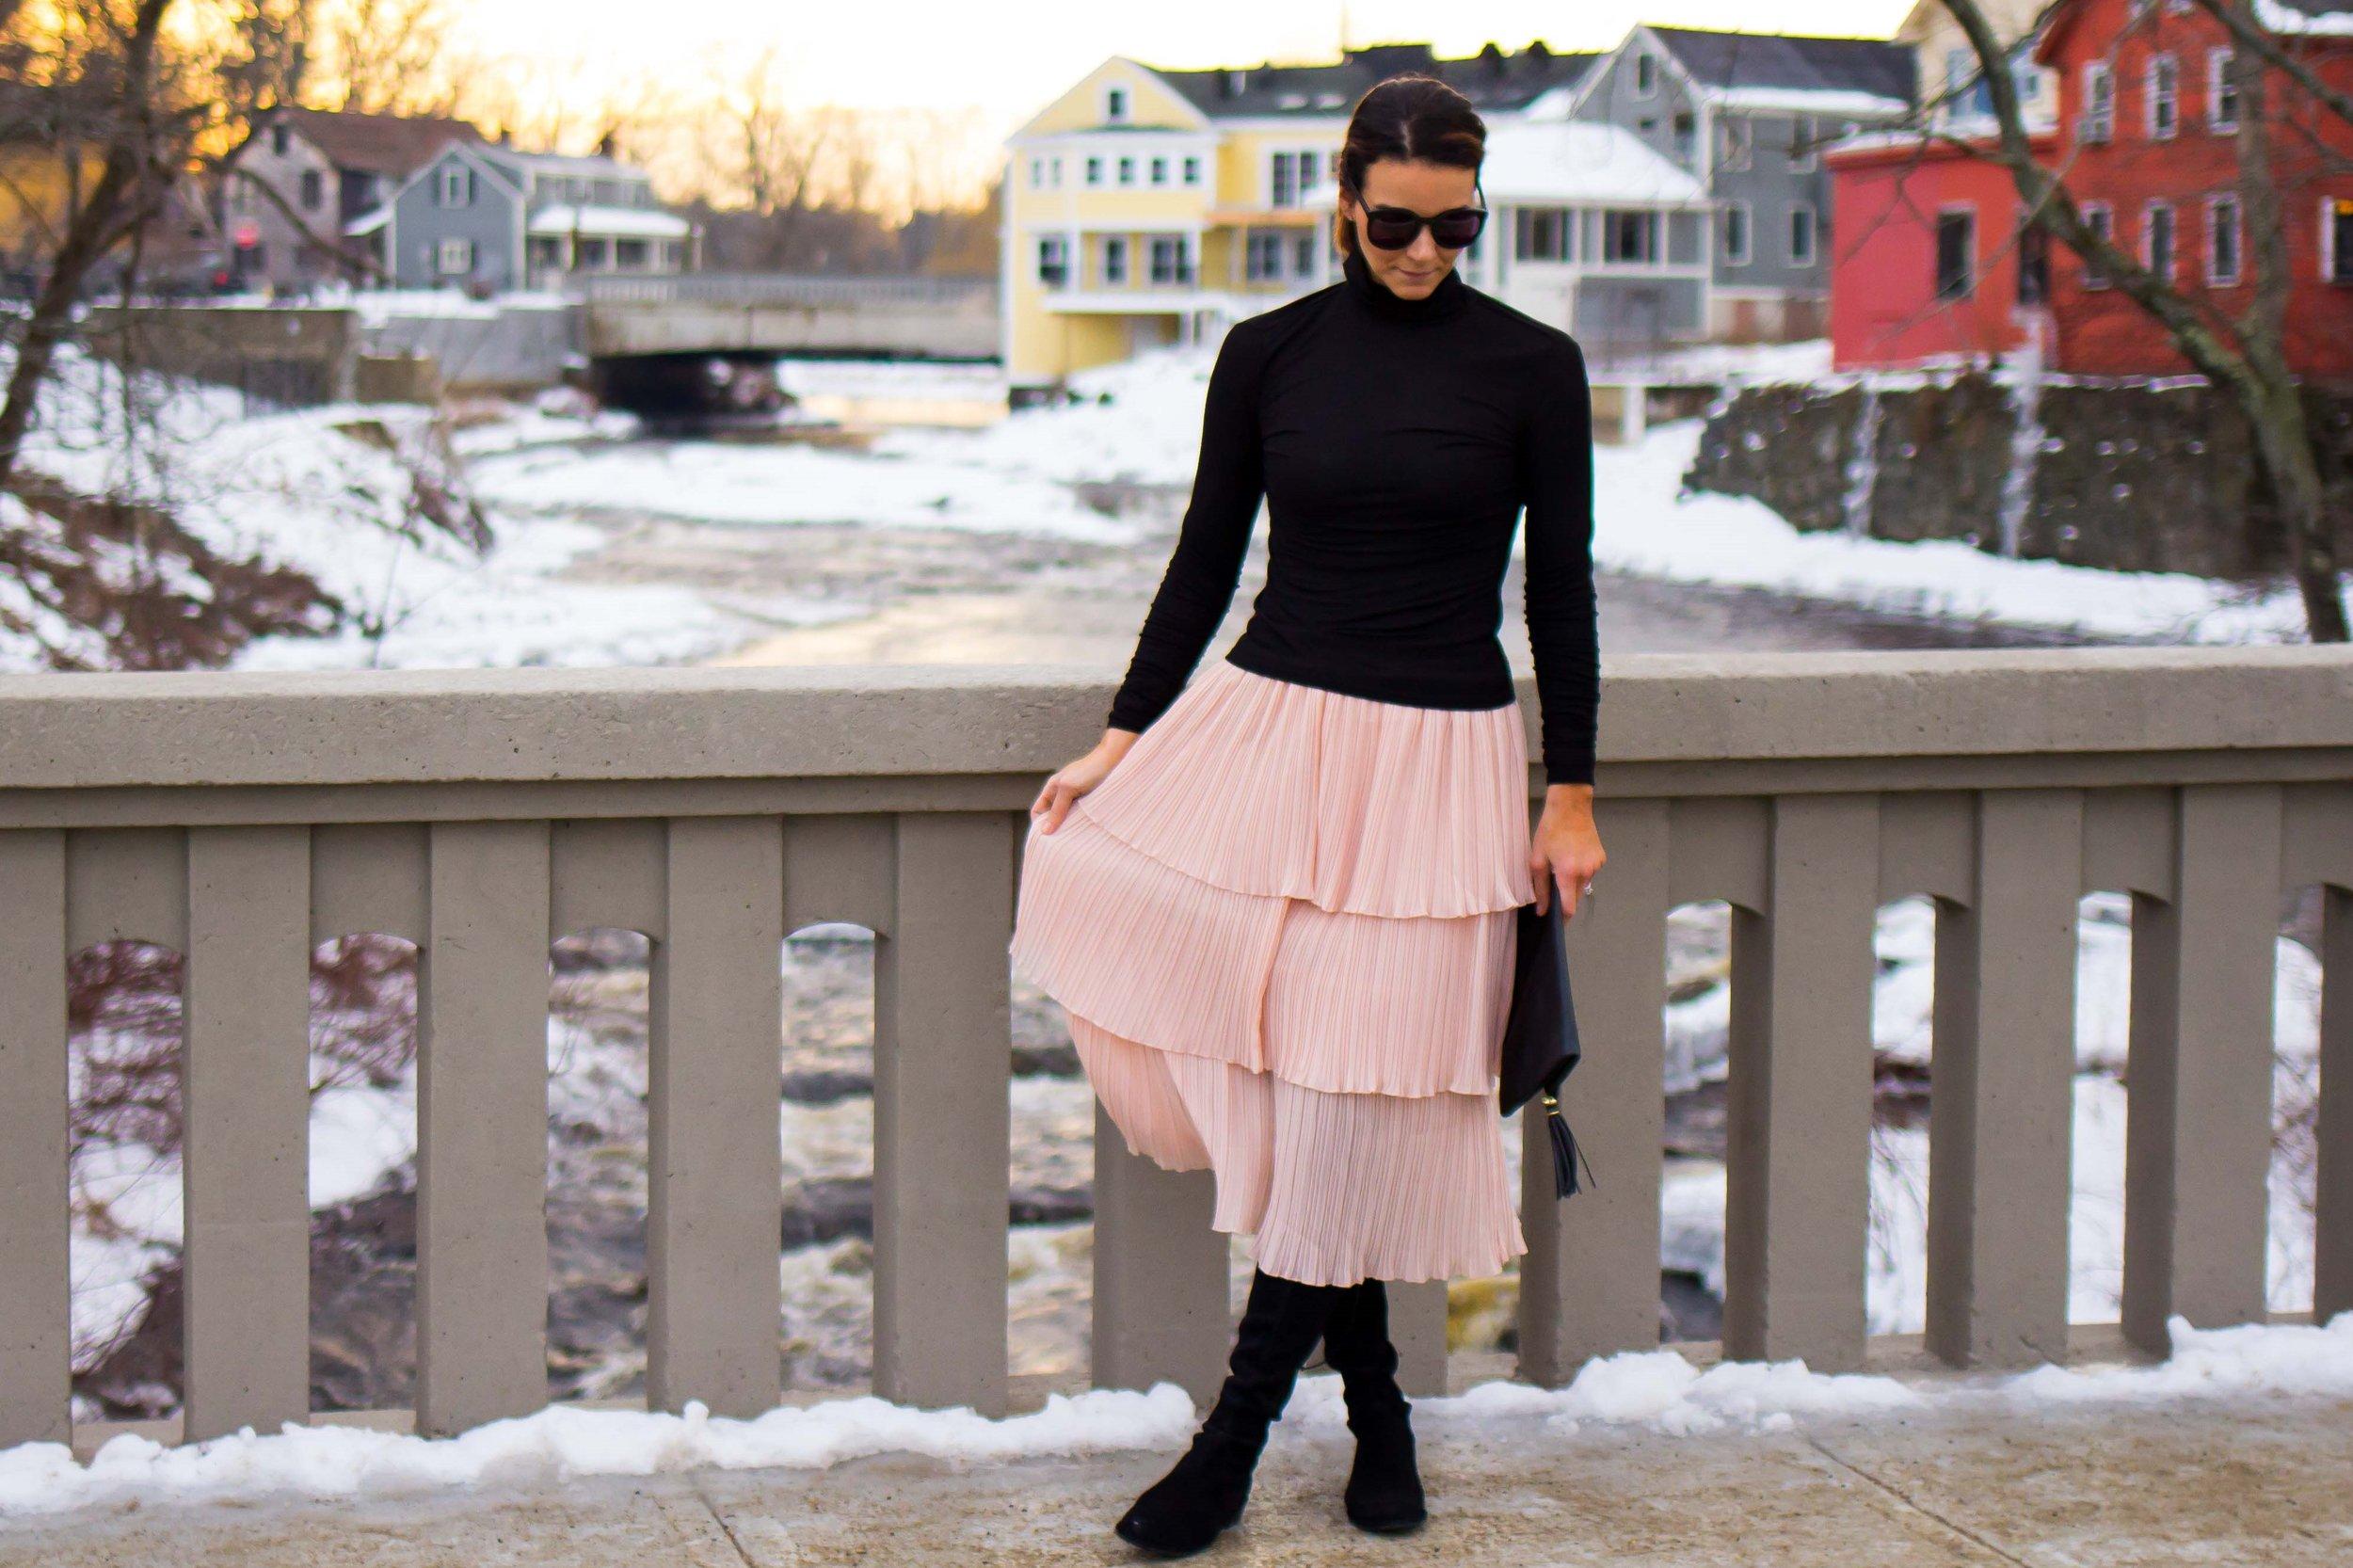 Midi Skirt Outfits - Tiered Skirt Outfits -Ruffle Midi Skirt Outfits - Nude Skirt Outfits - Blush Skirt Outfits - Weekend Outfits - Casual Outfits for Women - OTK Boot Outfits - Over the Knee Boot Outfits - Work Outfits for Women - Fashion for Women -  heartandseam.com  #heartandseam